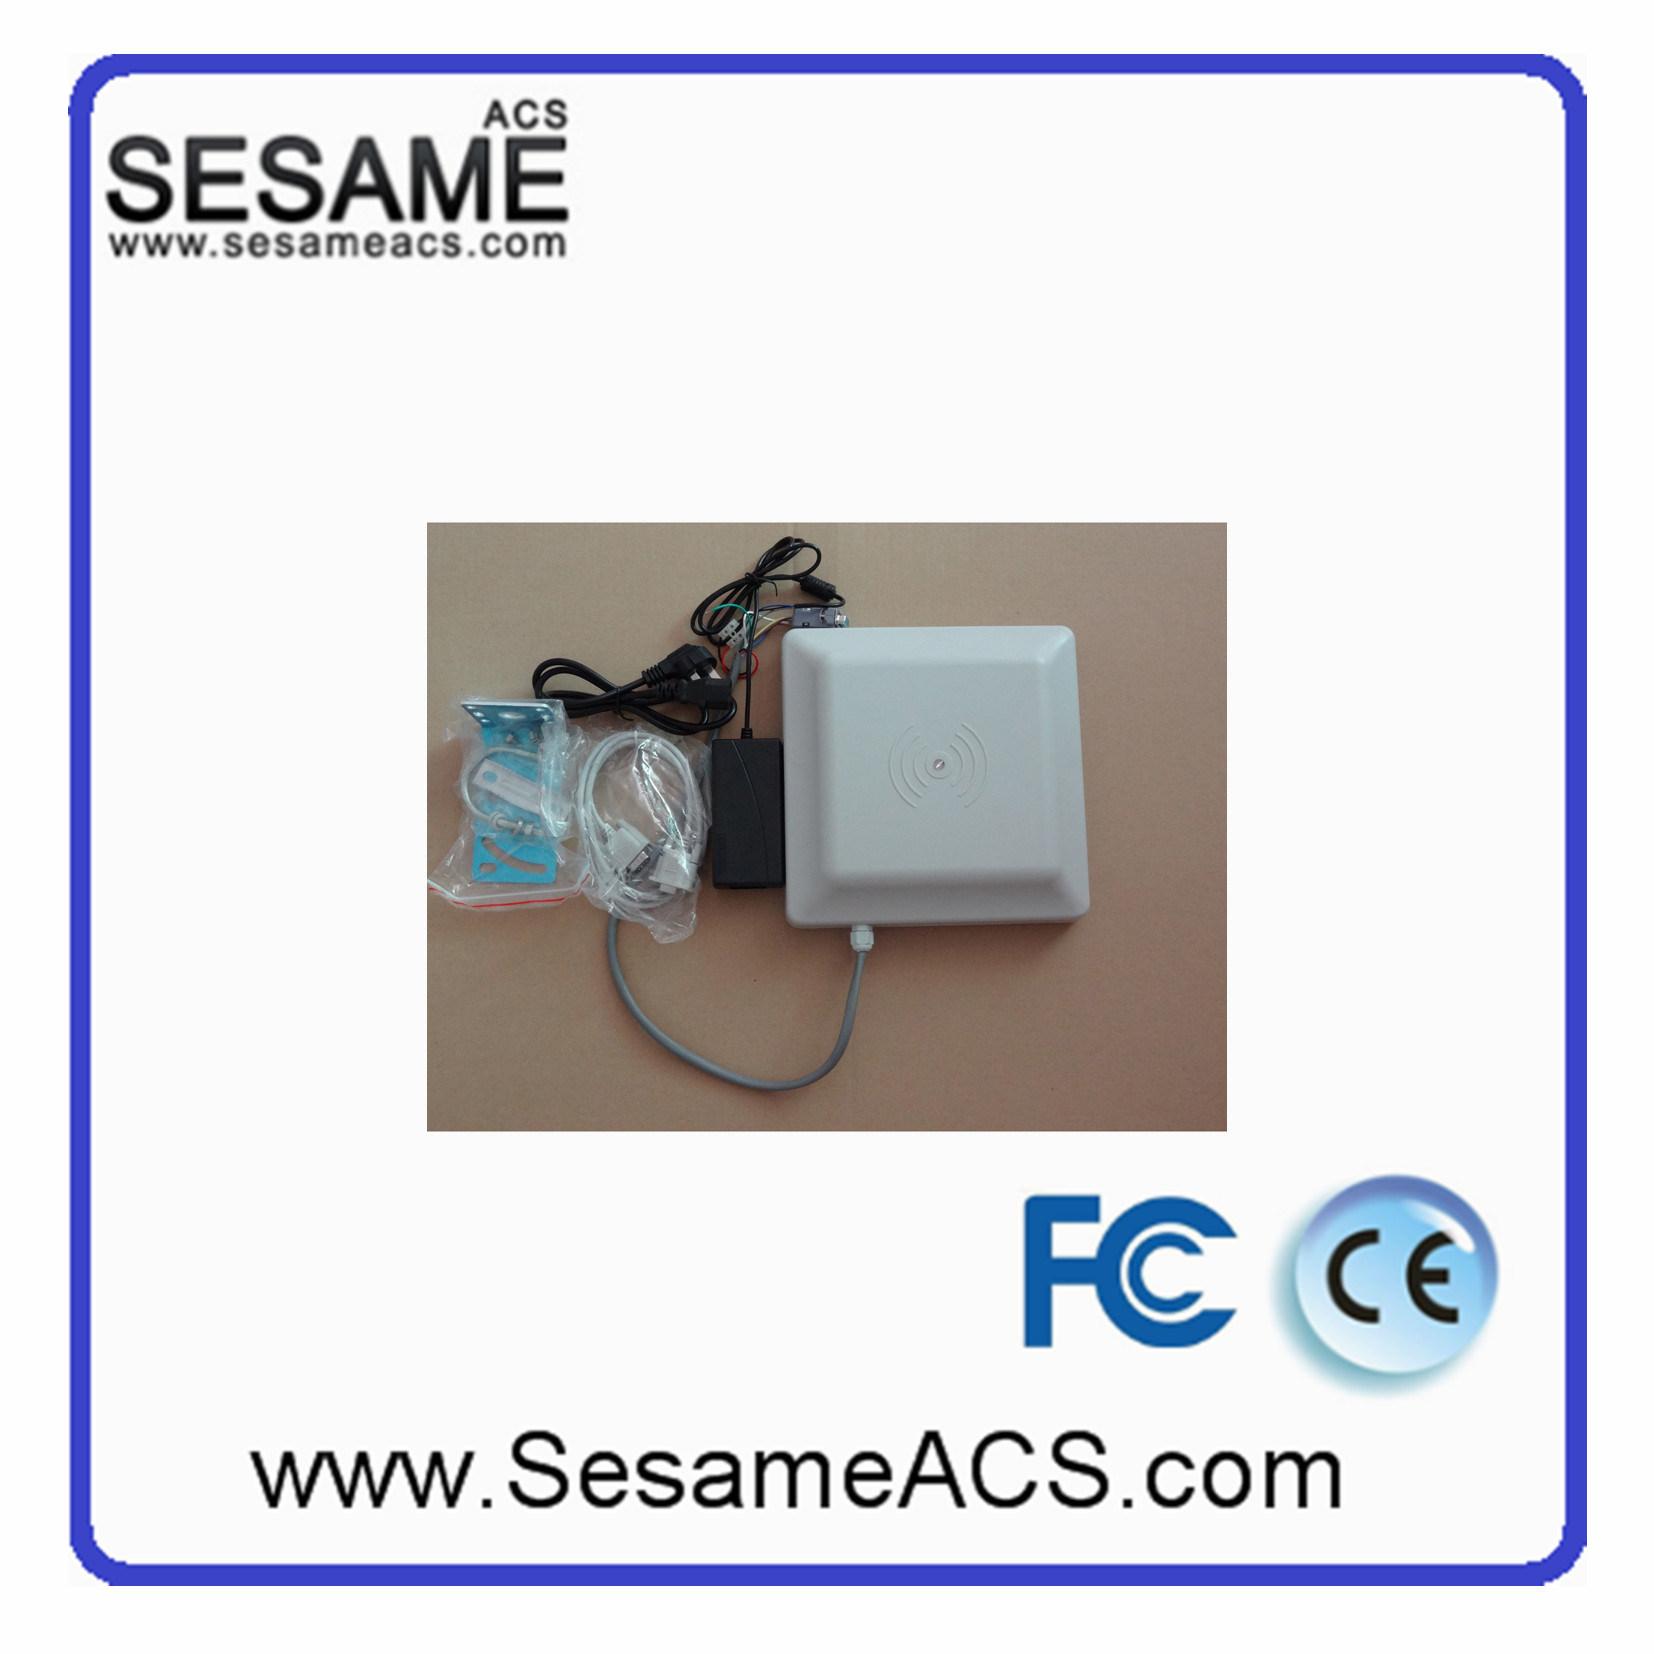 RFID Long Range UHF Reader Over 6-10 Meters (SLR12)